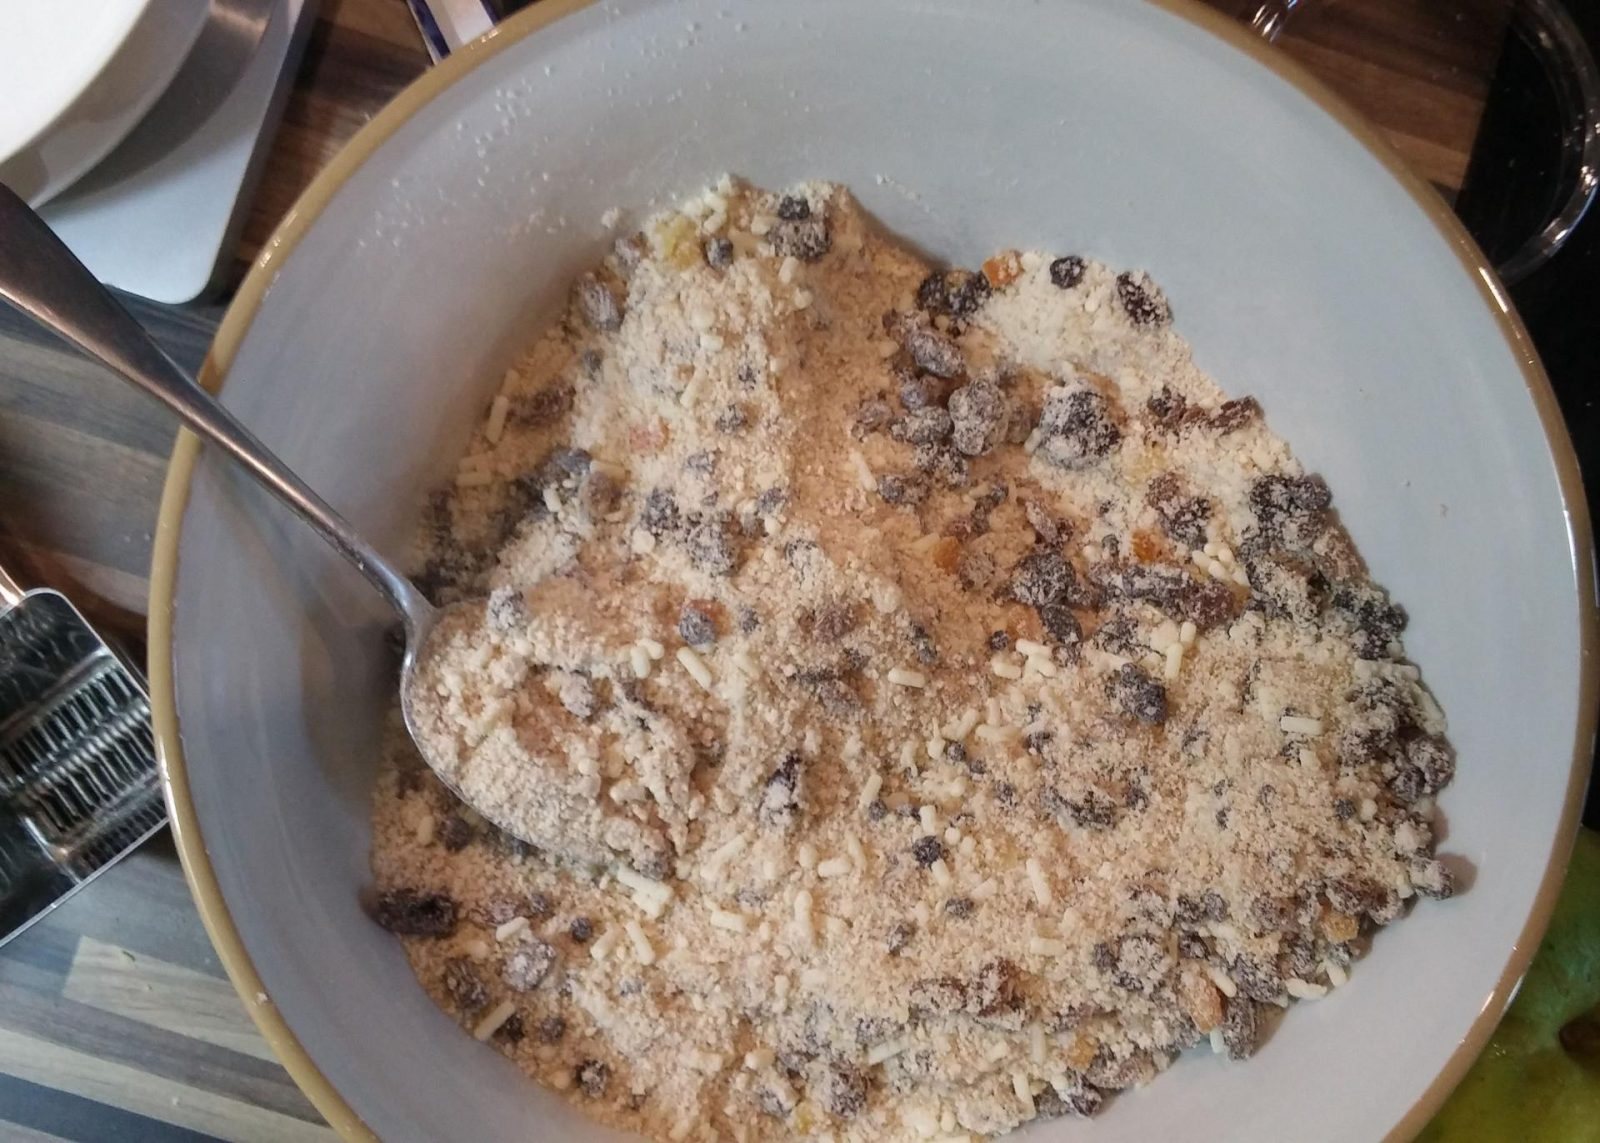 Christmas pudding recipe on Falcondale Life blog